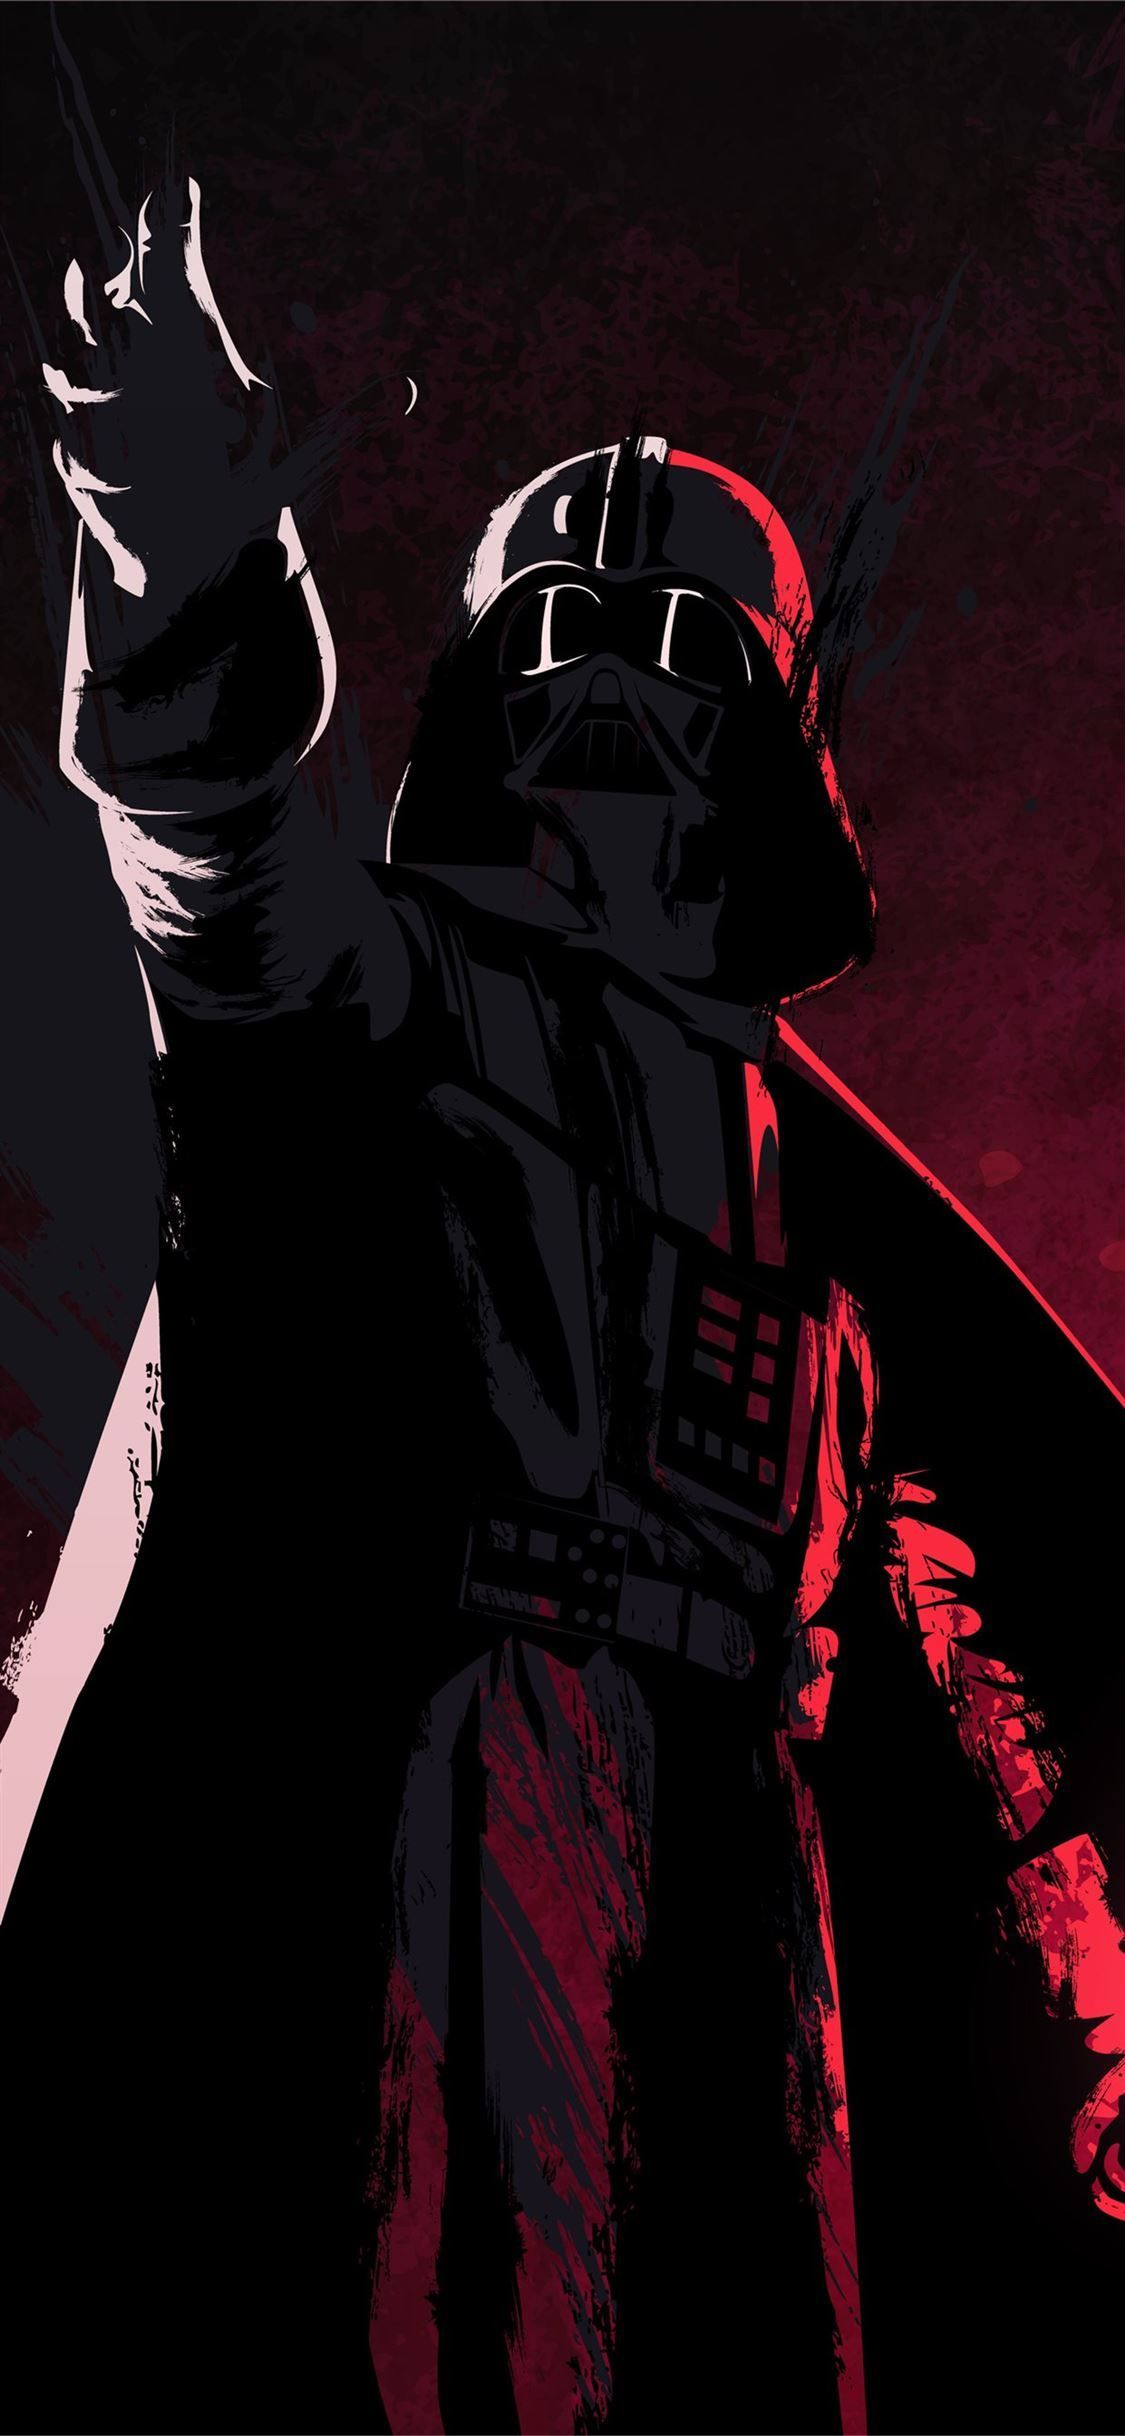 Tv Review The Mandalorian Strange Harbors Star Wars Wallpaper Star Wars Pictures Star Wars Background